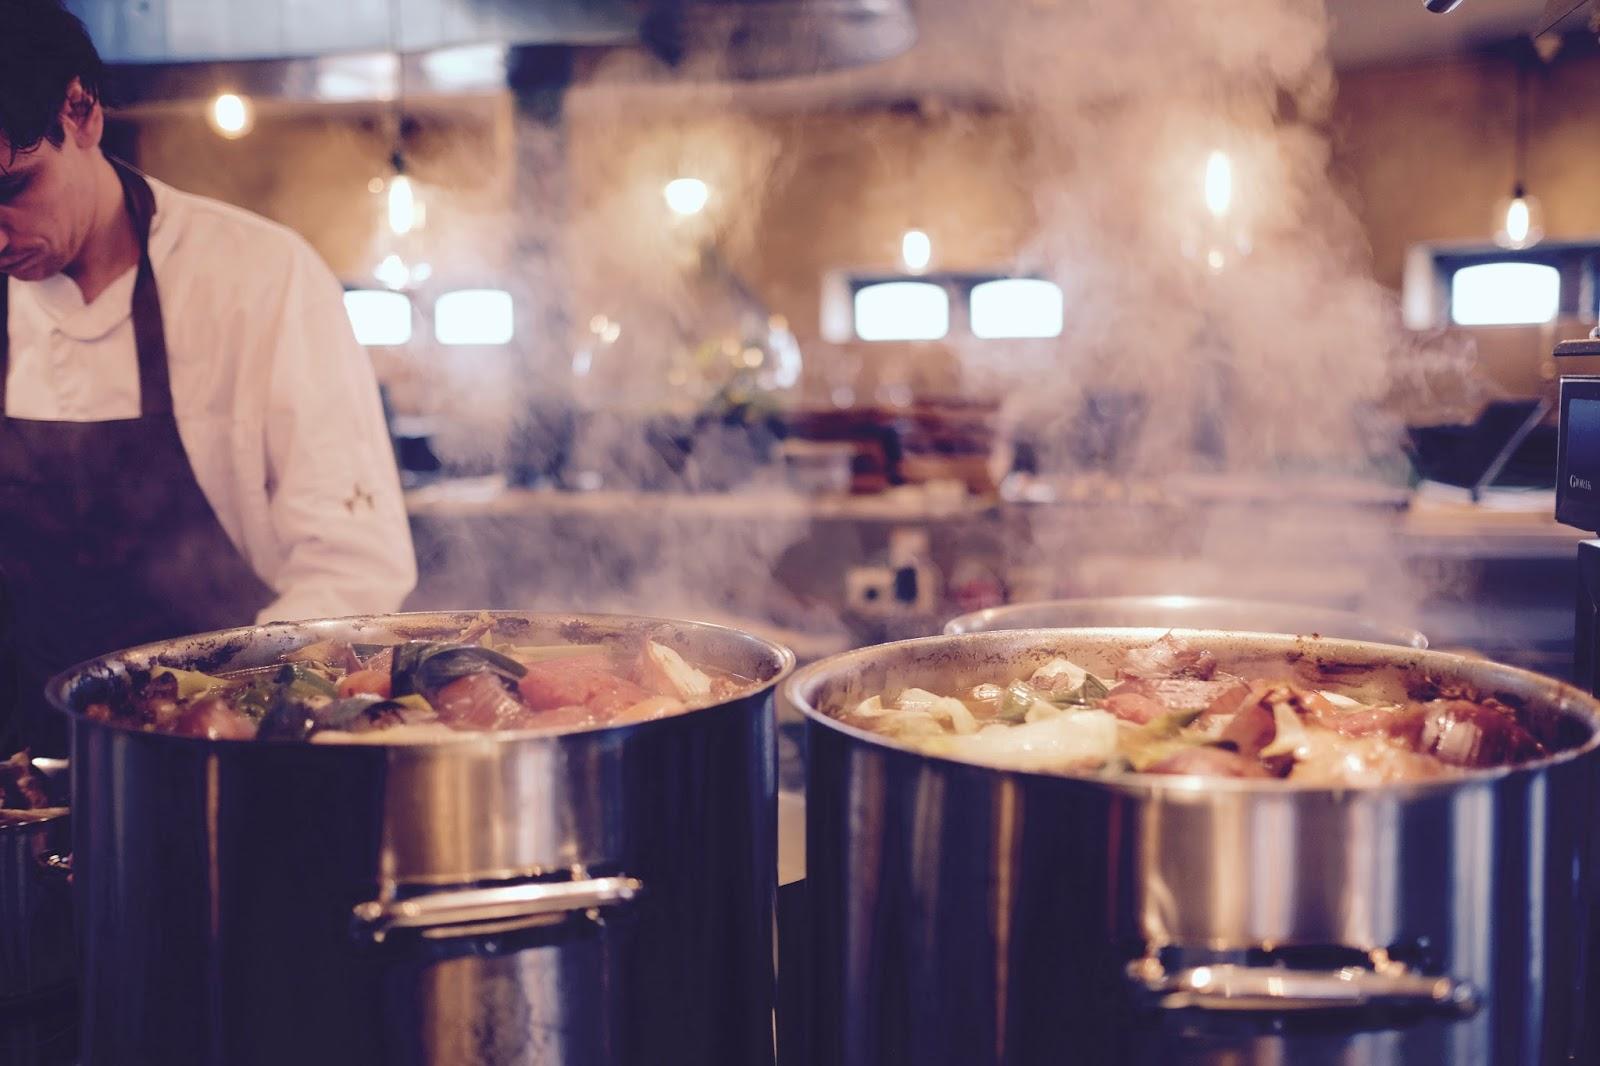 Kosakata Nama Alat Masak Di Dapur Dalam Bahasa Inggris Daily English Vocabulary